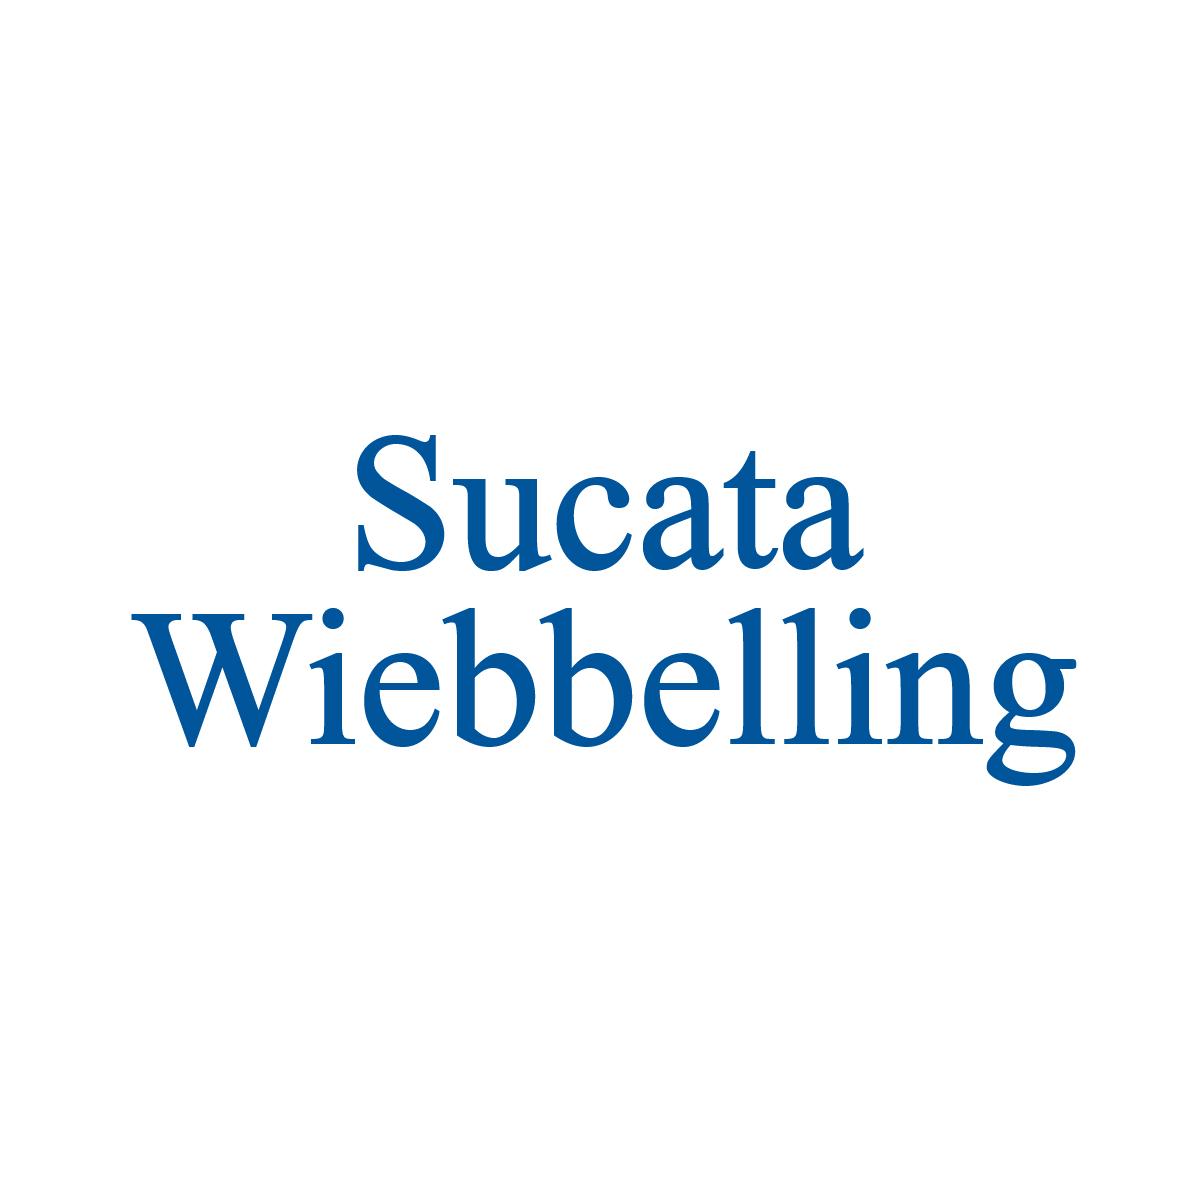 Sucata Wiebbelling